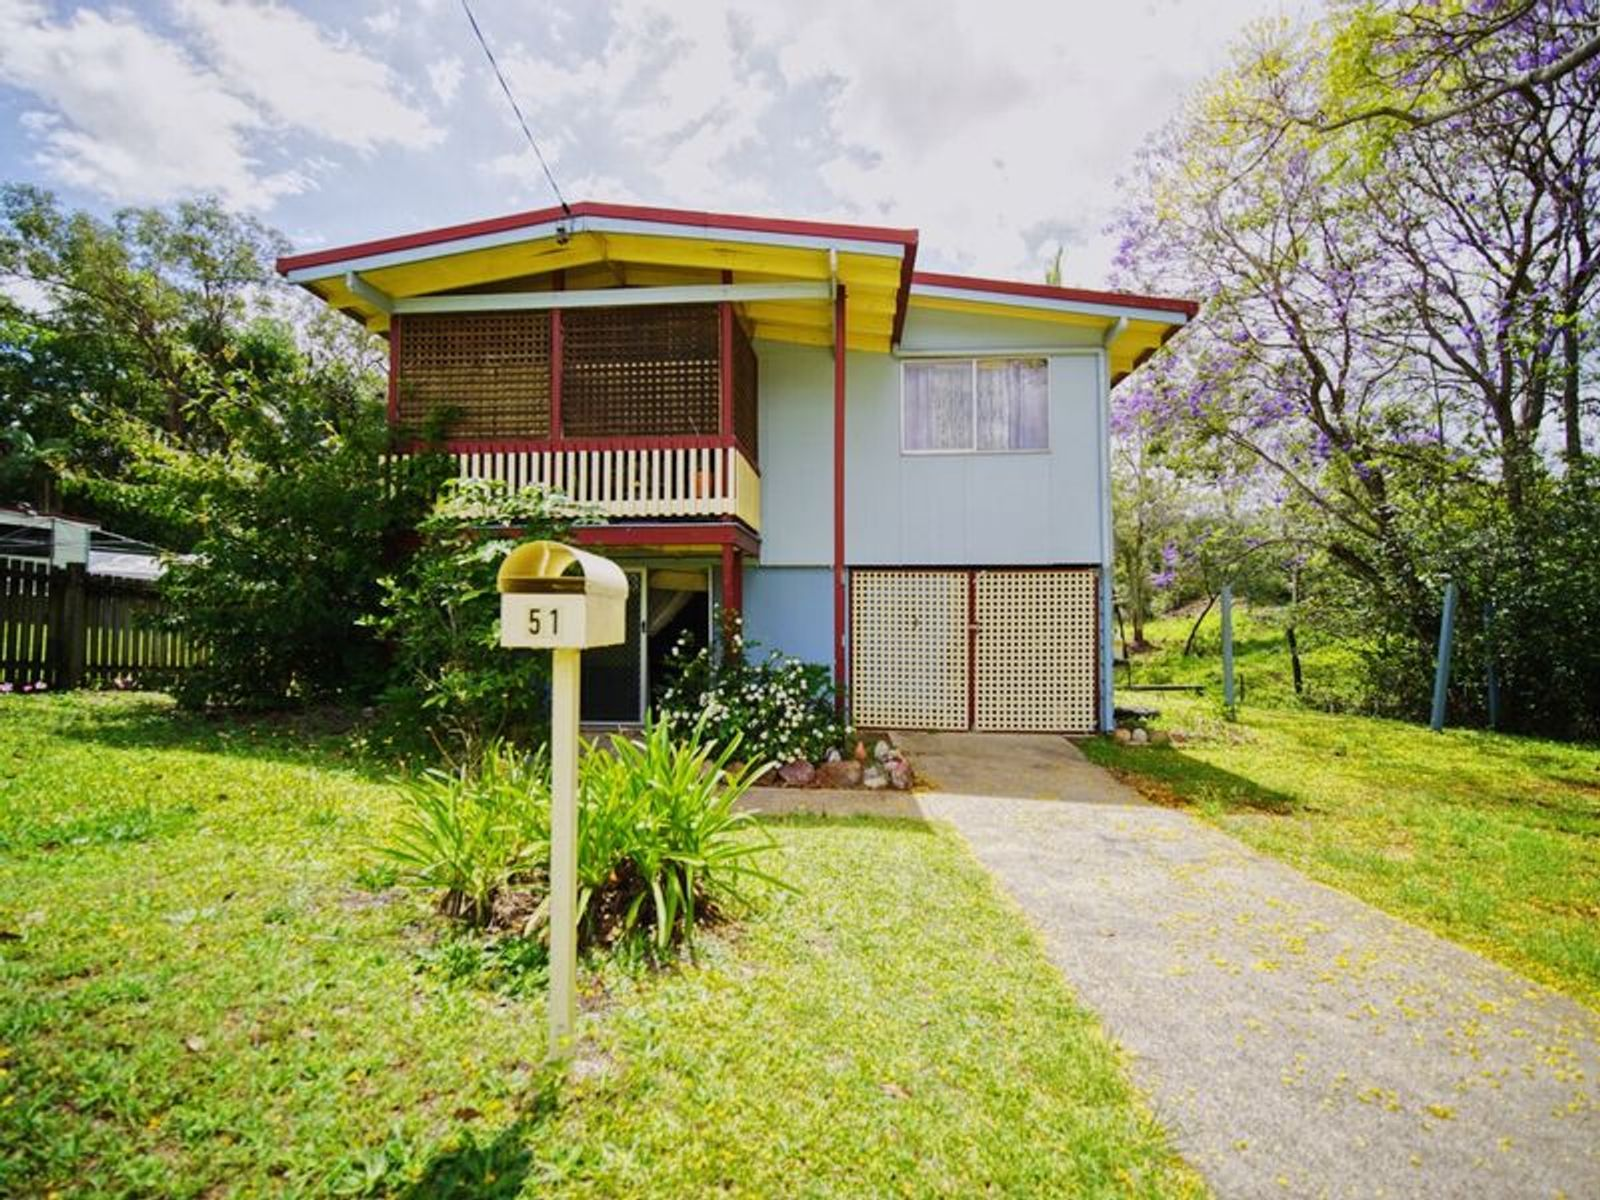 51 Tucker Street, Gympie, QLD 4570